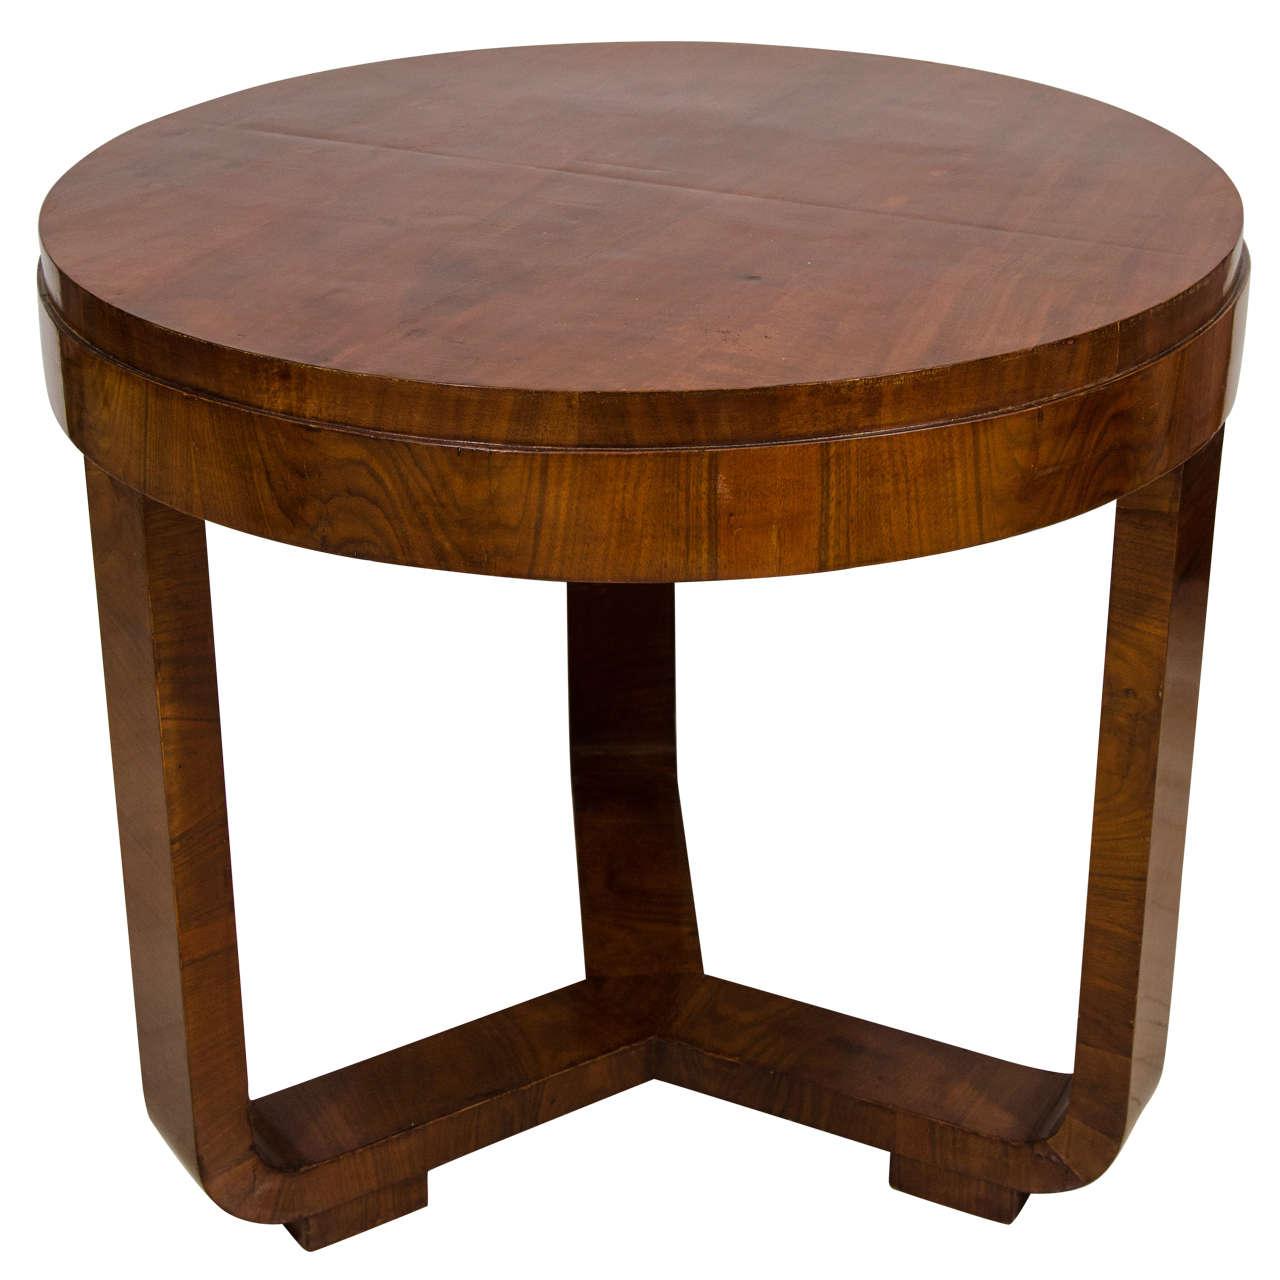 bauhaus style round walnut table at 1stdibs